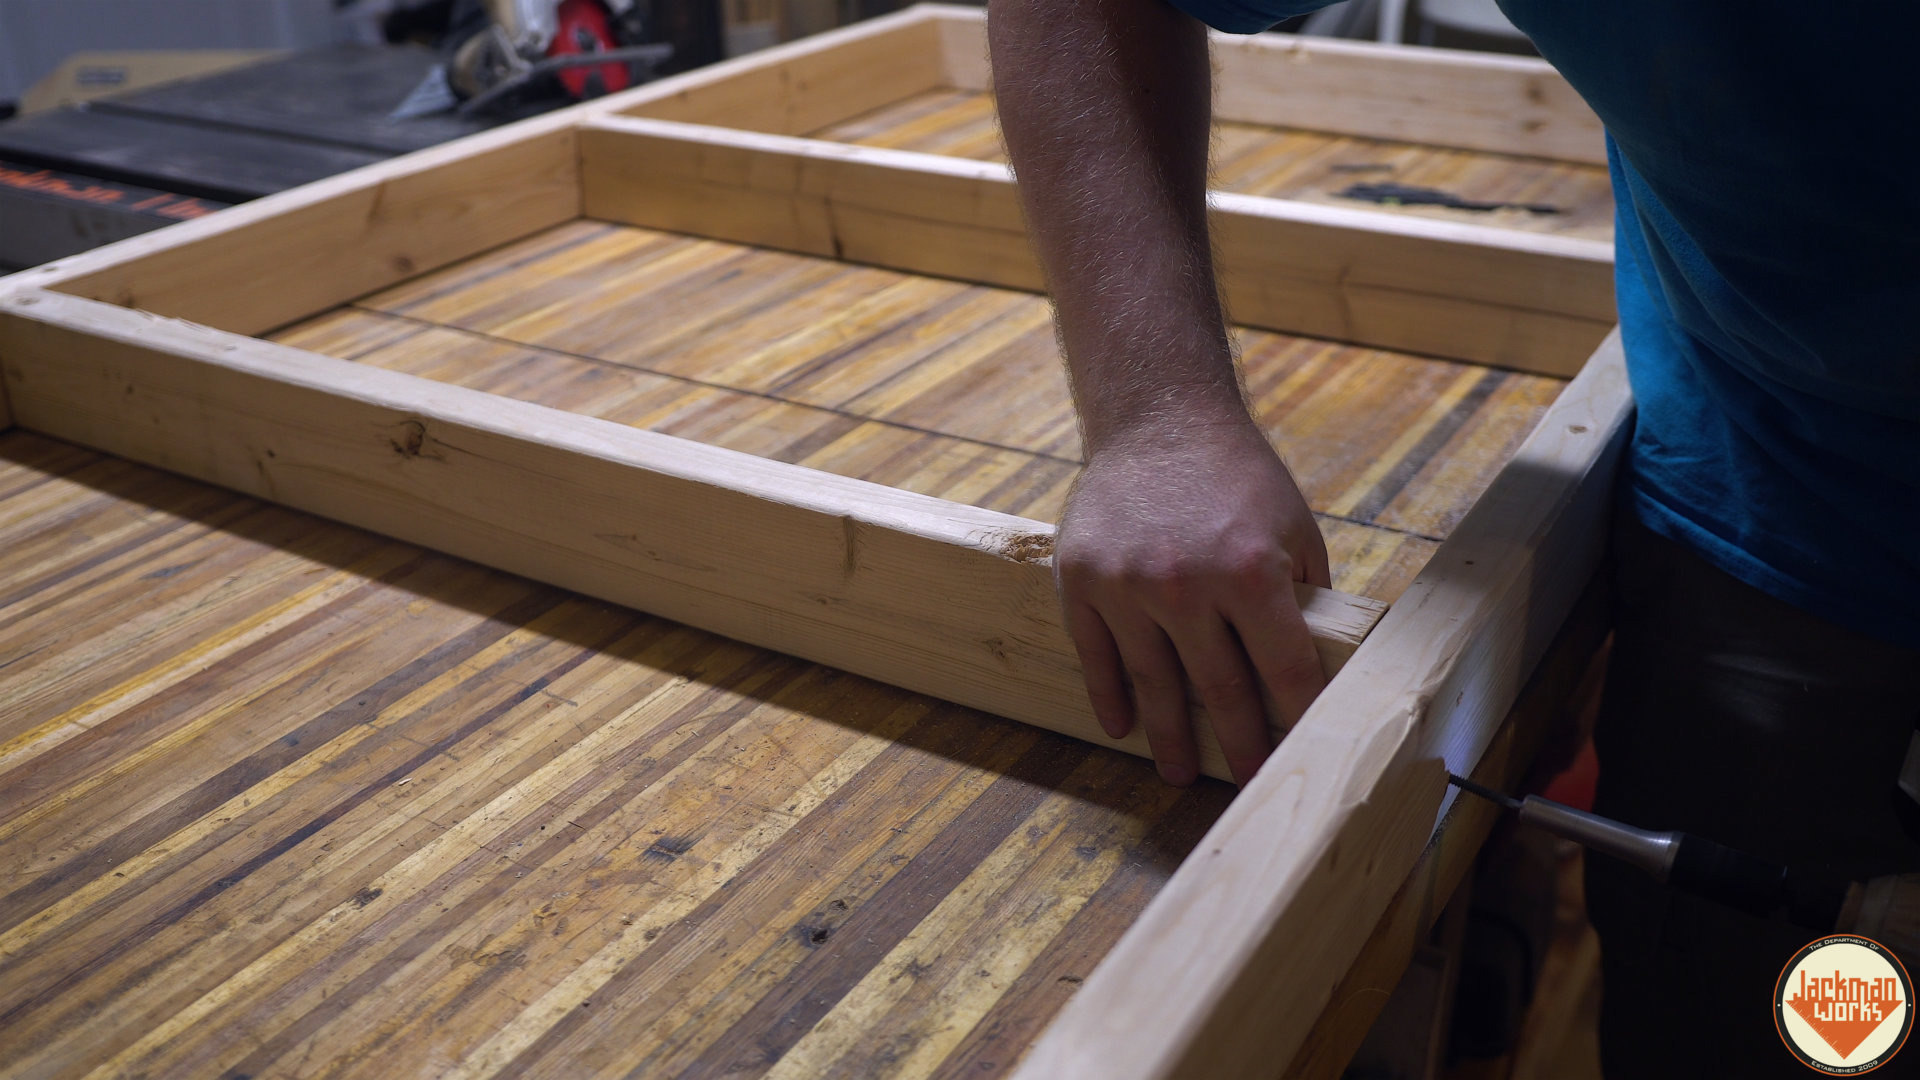 Storage,DIY Storage,Clamp Rack,Small Shop,Small Shop Storage,Compact Clamp  Rack,woodworking,diy,clamp,clamp Racks U2013 Woodworking,clamp Rack Wood  Whisperer ...